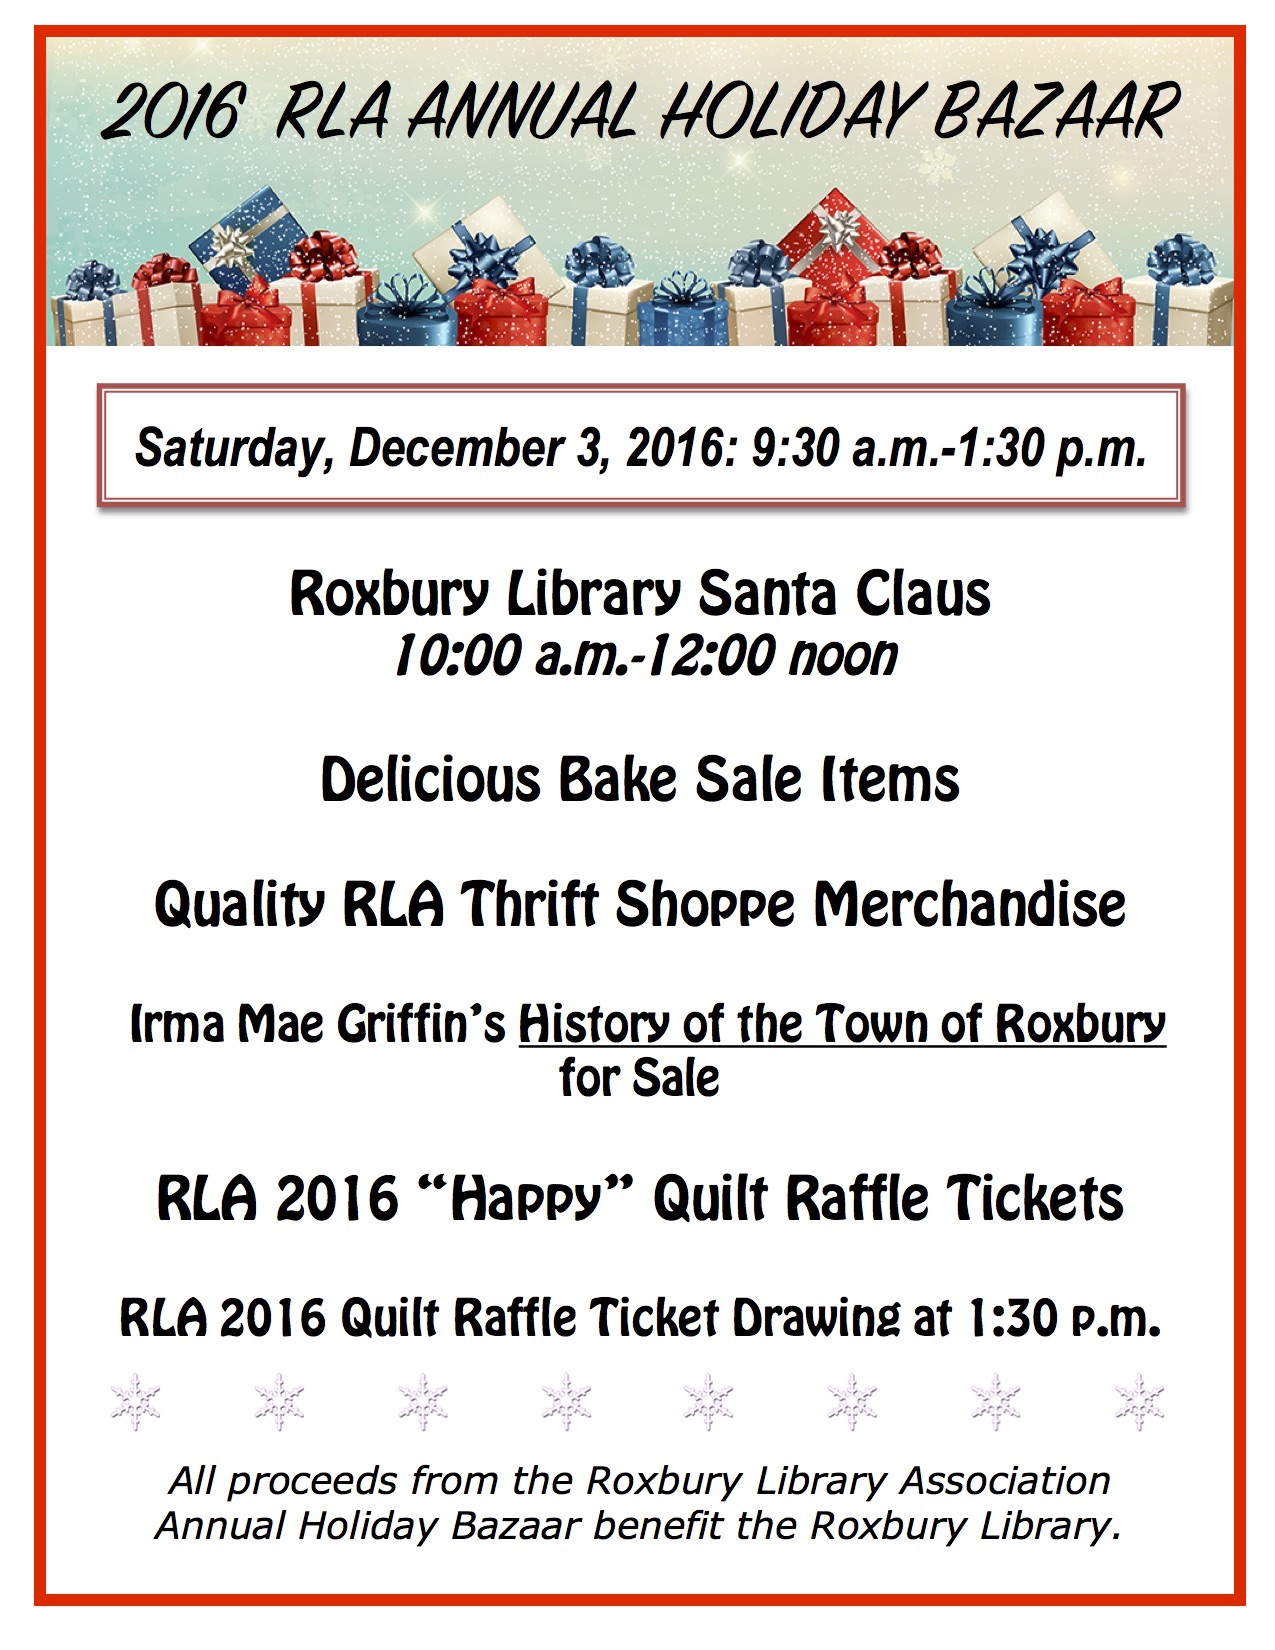 2016 Roxbury Library Assocation Annual Holiday Bazaar